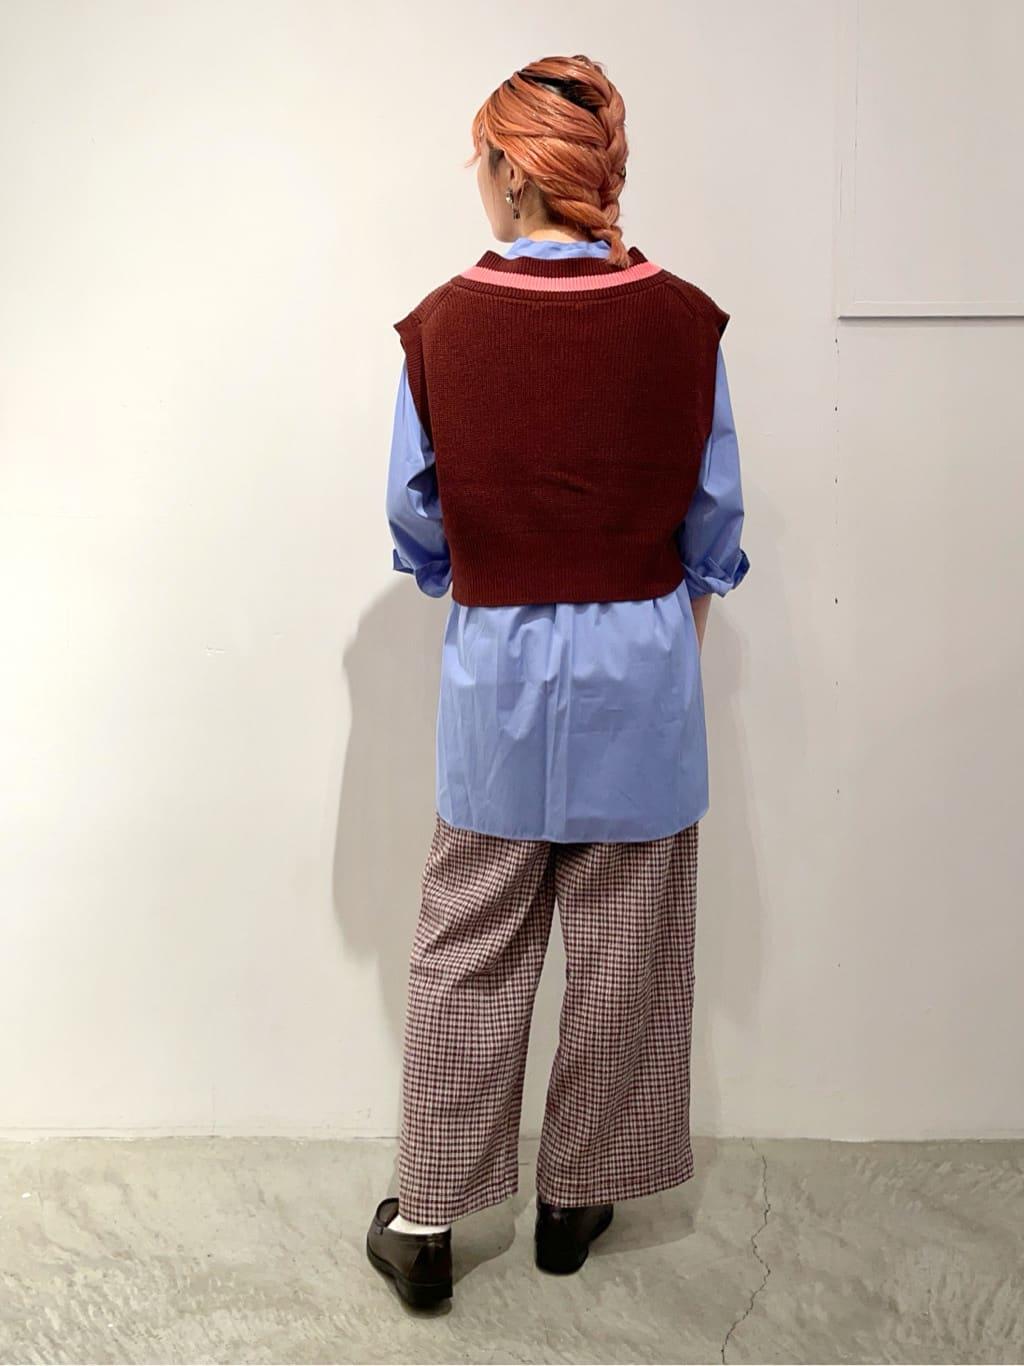 - CHILD WOMAN 原宿路面 身長:160cm 2021.09.09